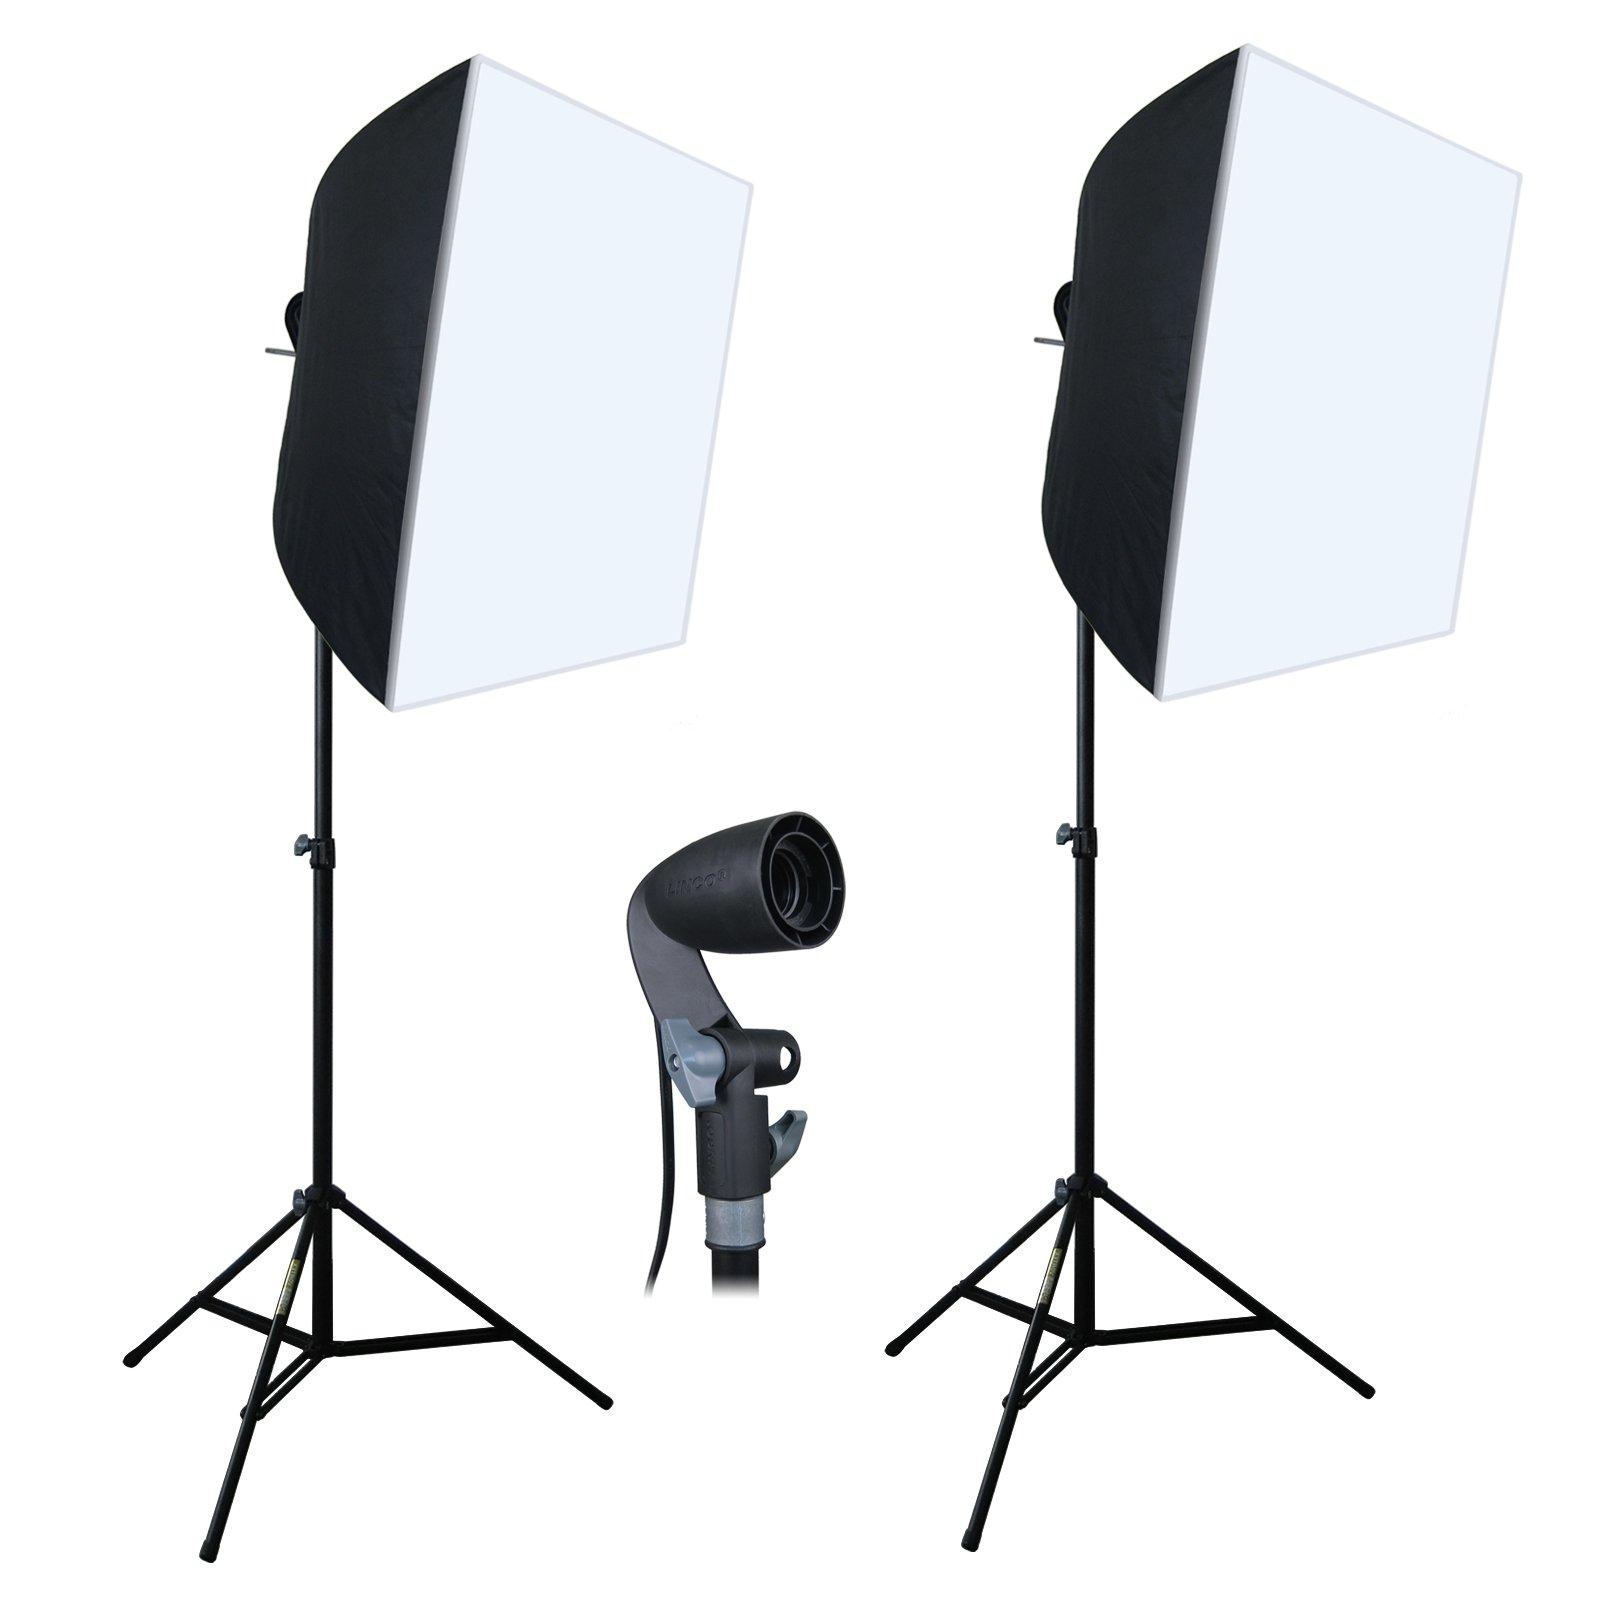 Linco Lincostore Photography Equipment Photo Studio Lighting 24''x24'' Softbox Light Kit AM141M